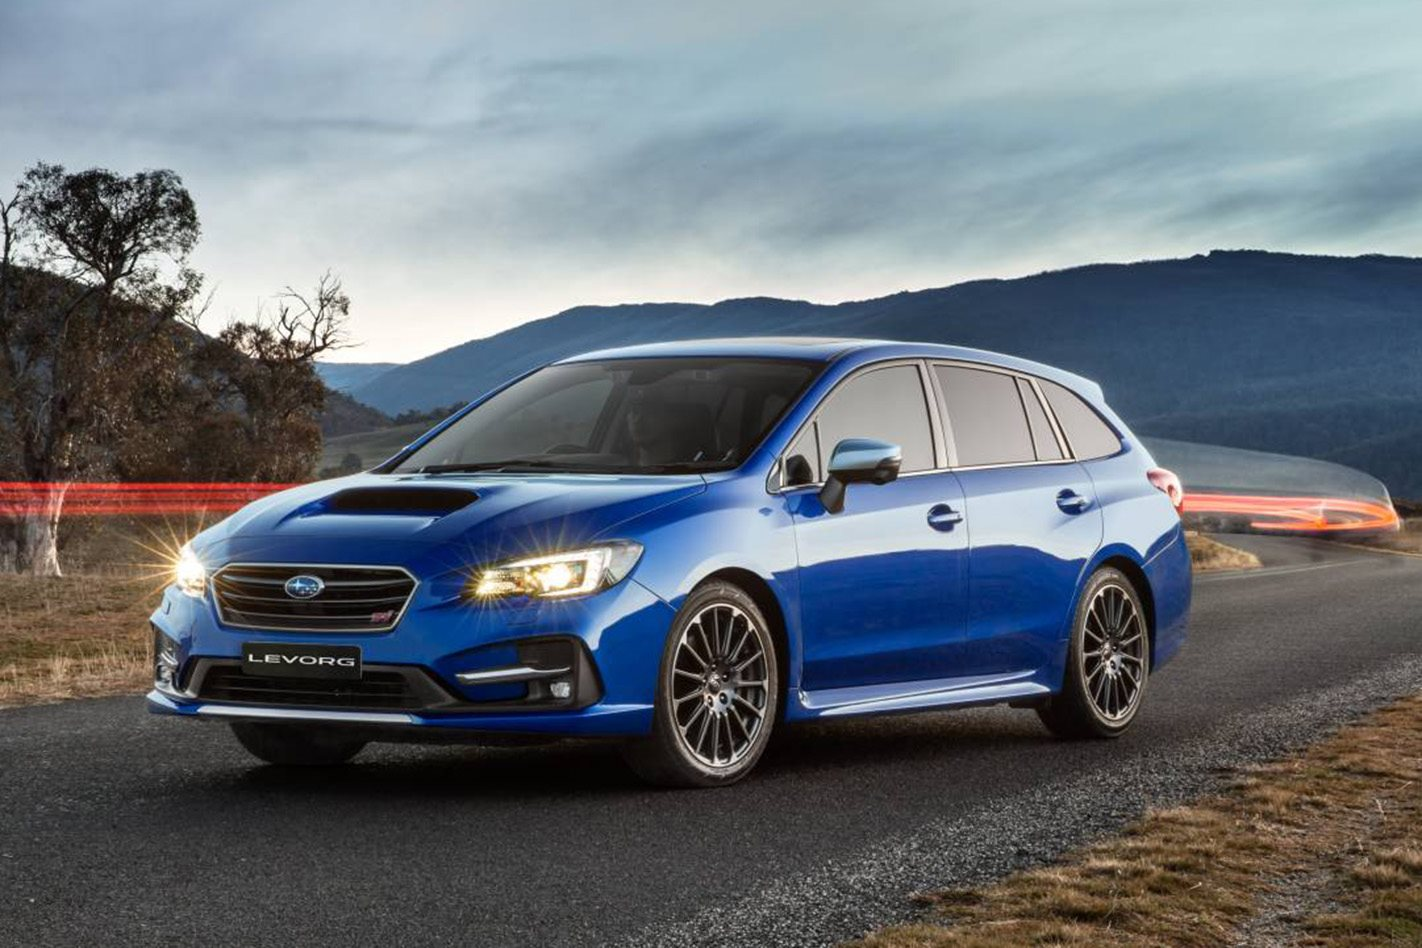 Subaru Impreza Wagon 2018 >> 2018 Subaru Levorg price and features – range expands with new 1.6 turbo